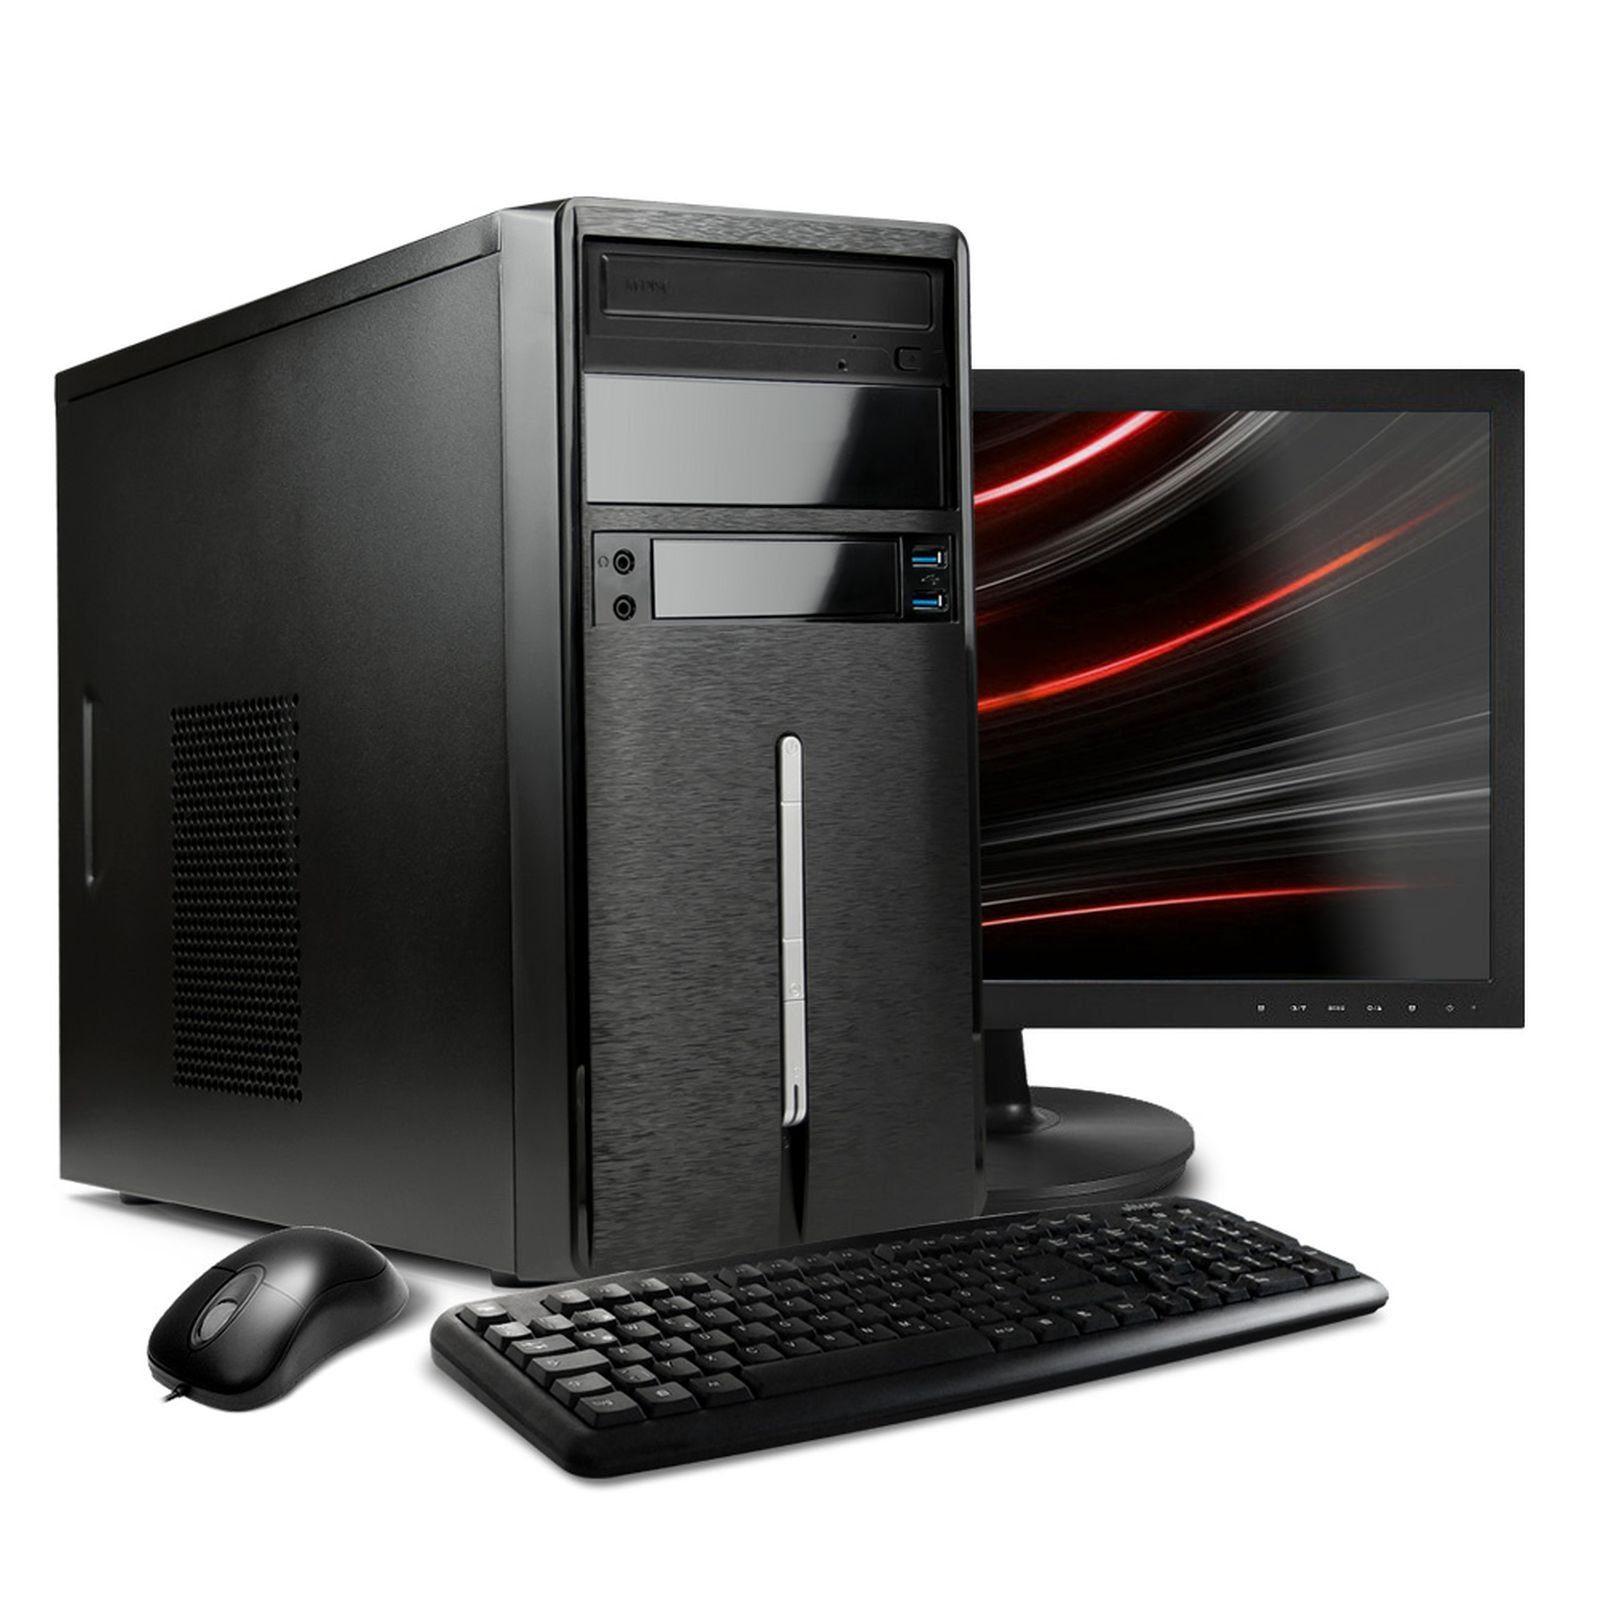 "VCM PC-Set / AMD FX-4300 (4x 3.8 GHz), Radeon R7 240 »/ 4 GB / Windows 10 / 22"" TFT«"